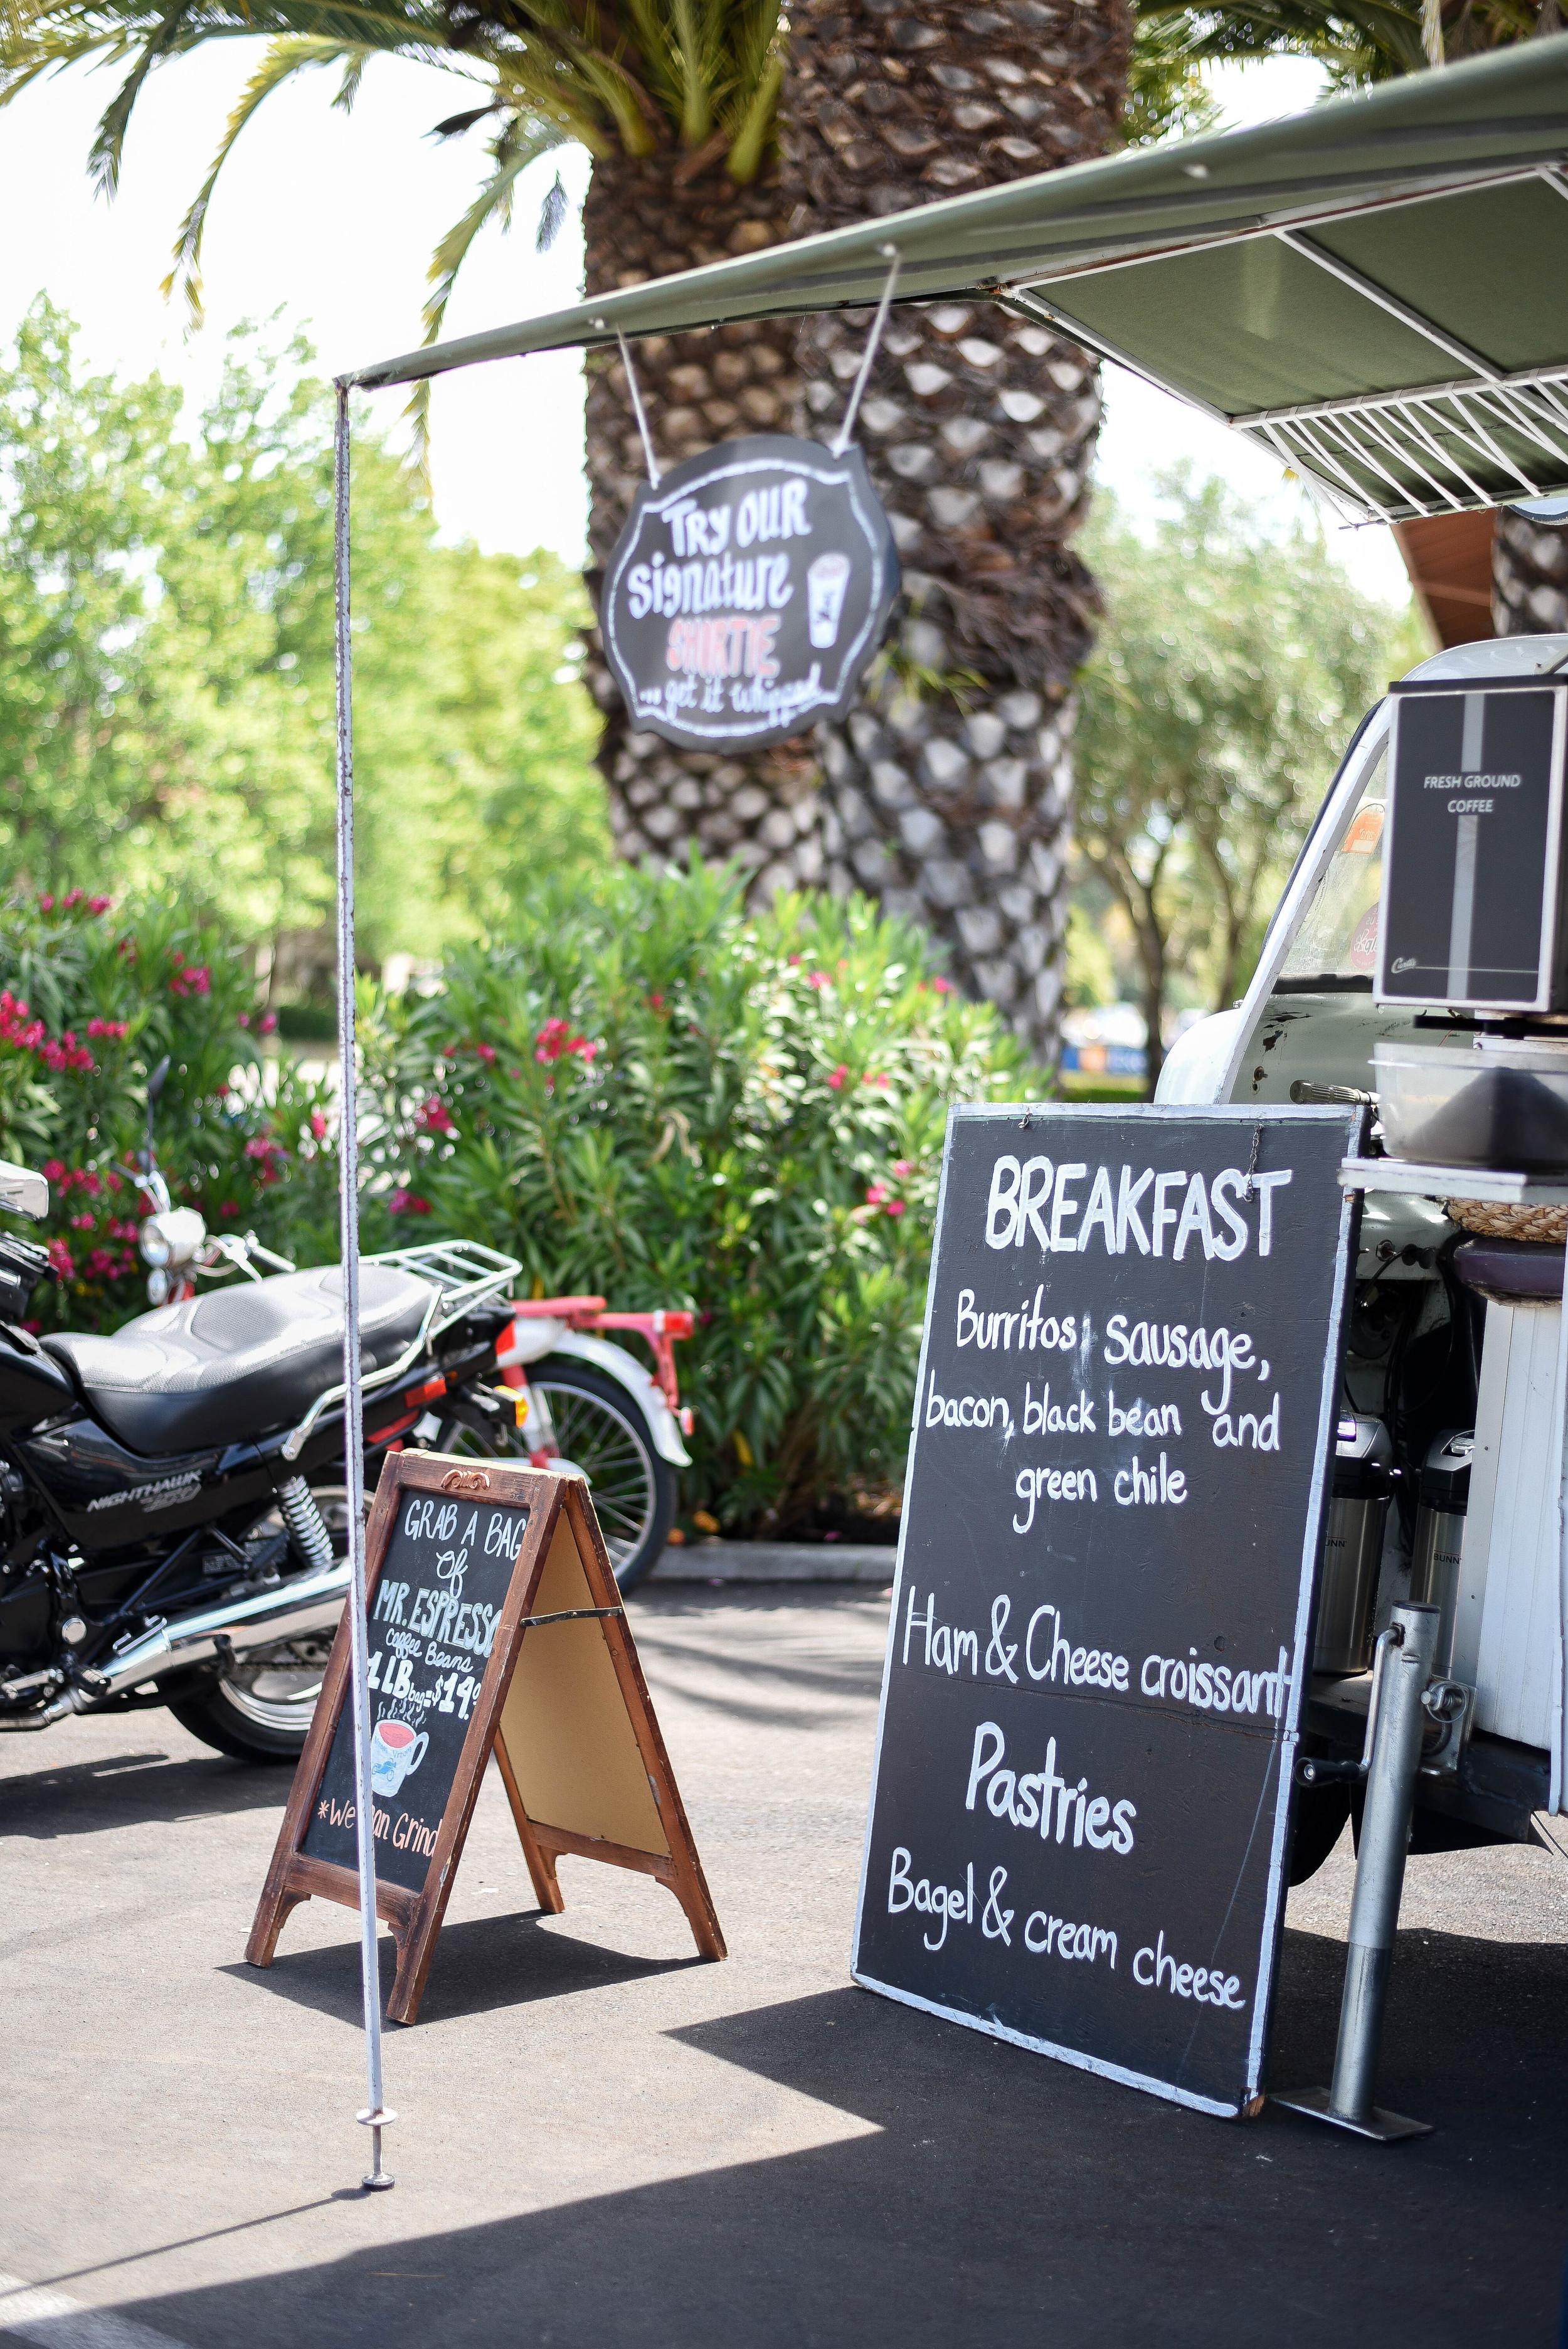 Cafe Scooteria & Sorento Imports in Sonoma | asavvylifestyle.com